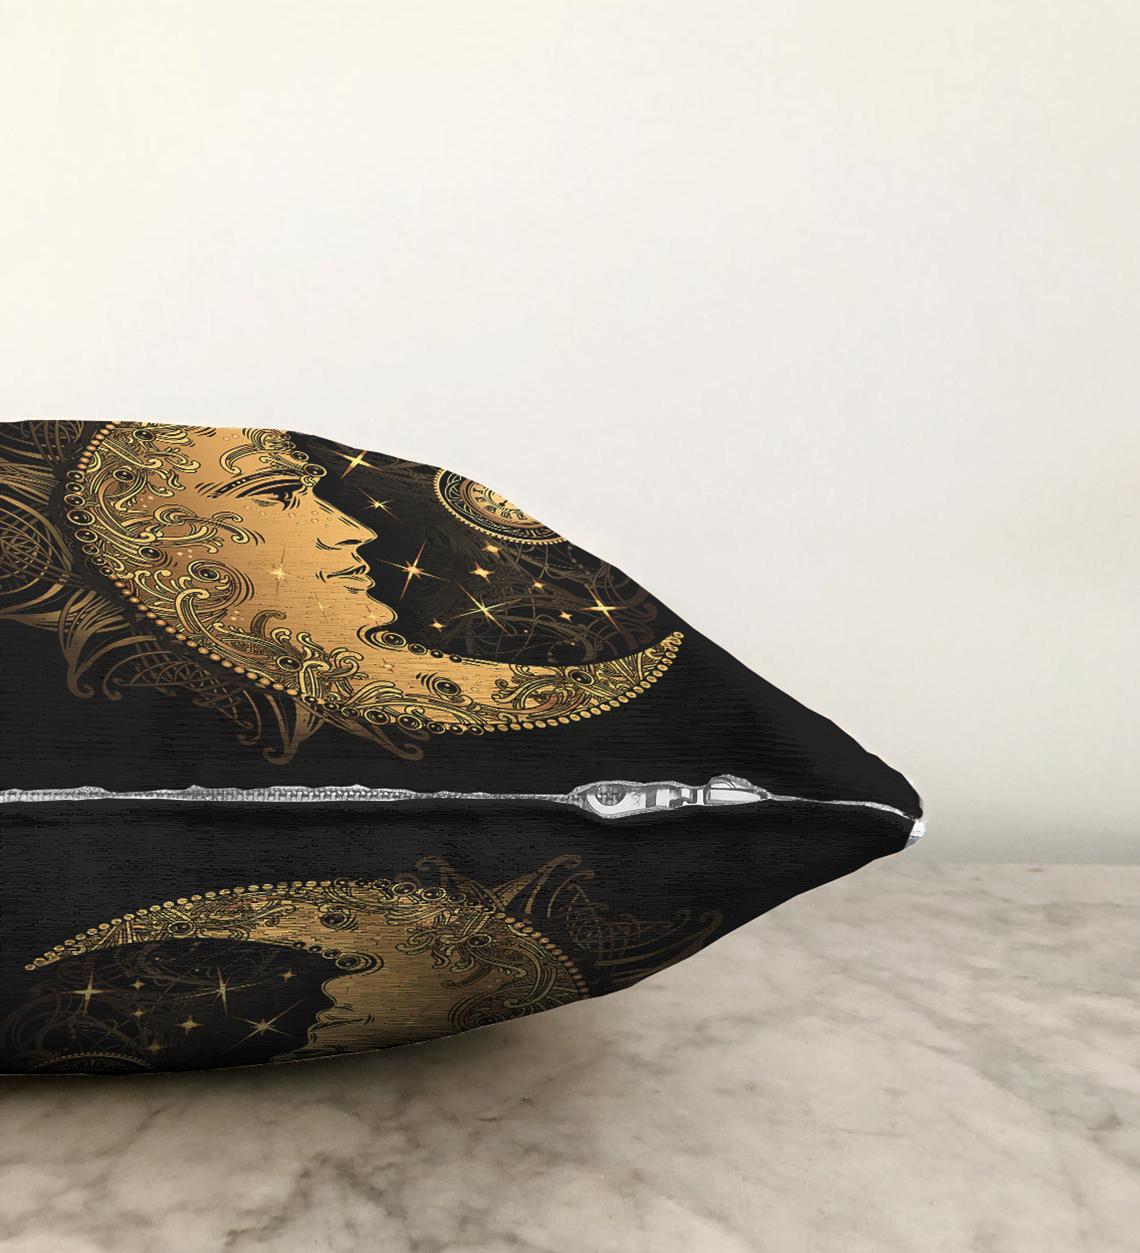 Realhomes Çift Taraflı Özel Tasarım Gold Ay Desenli Saat Şönil Kırlent Kılıfı - 55 x 55 cm Realhomes